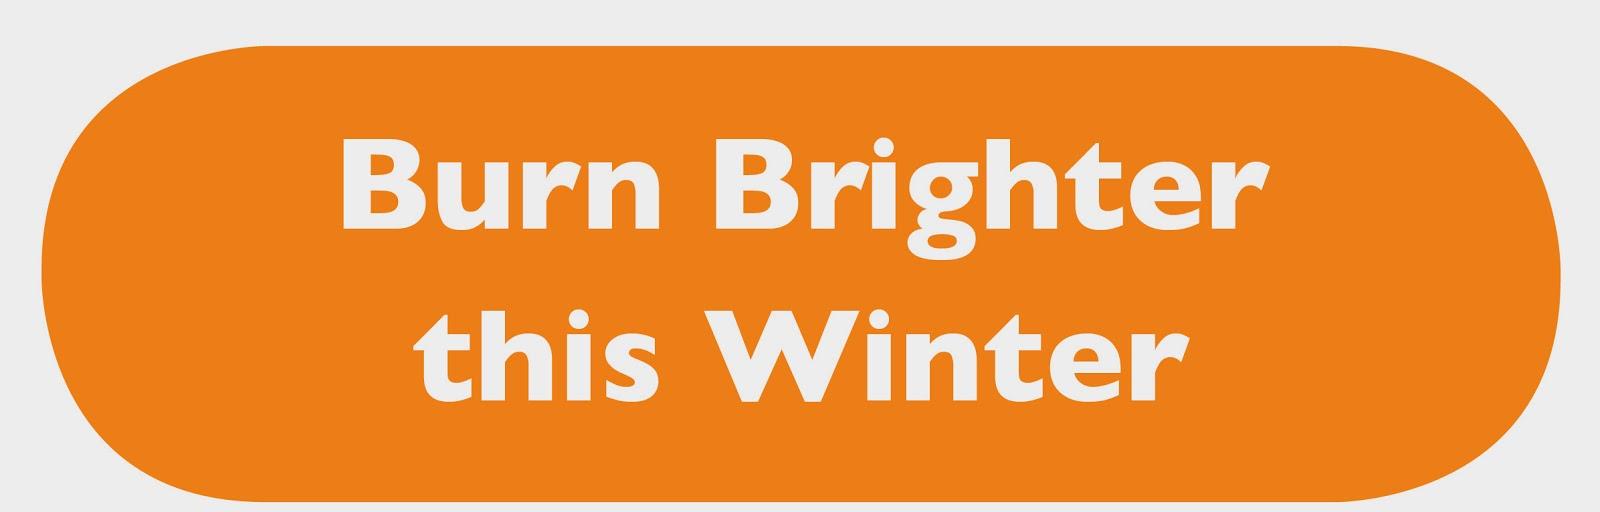 "Text ""Burn Brighter this Winter"" on orange background"